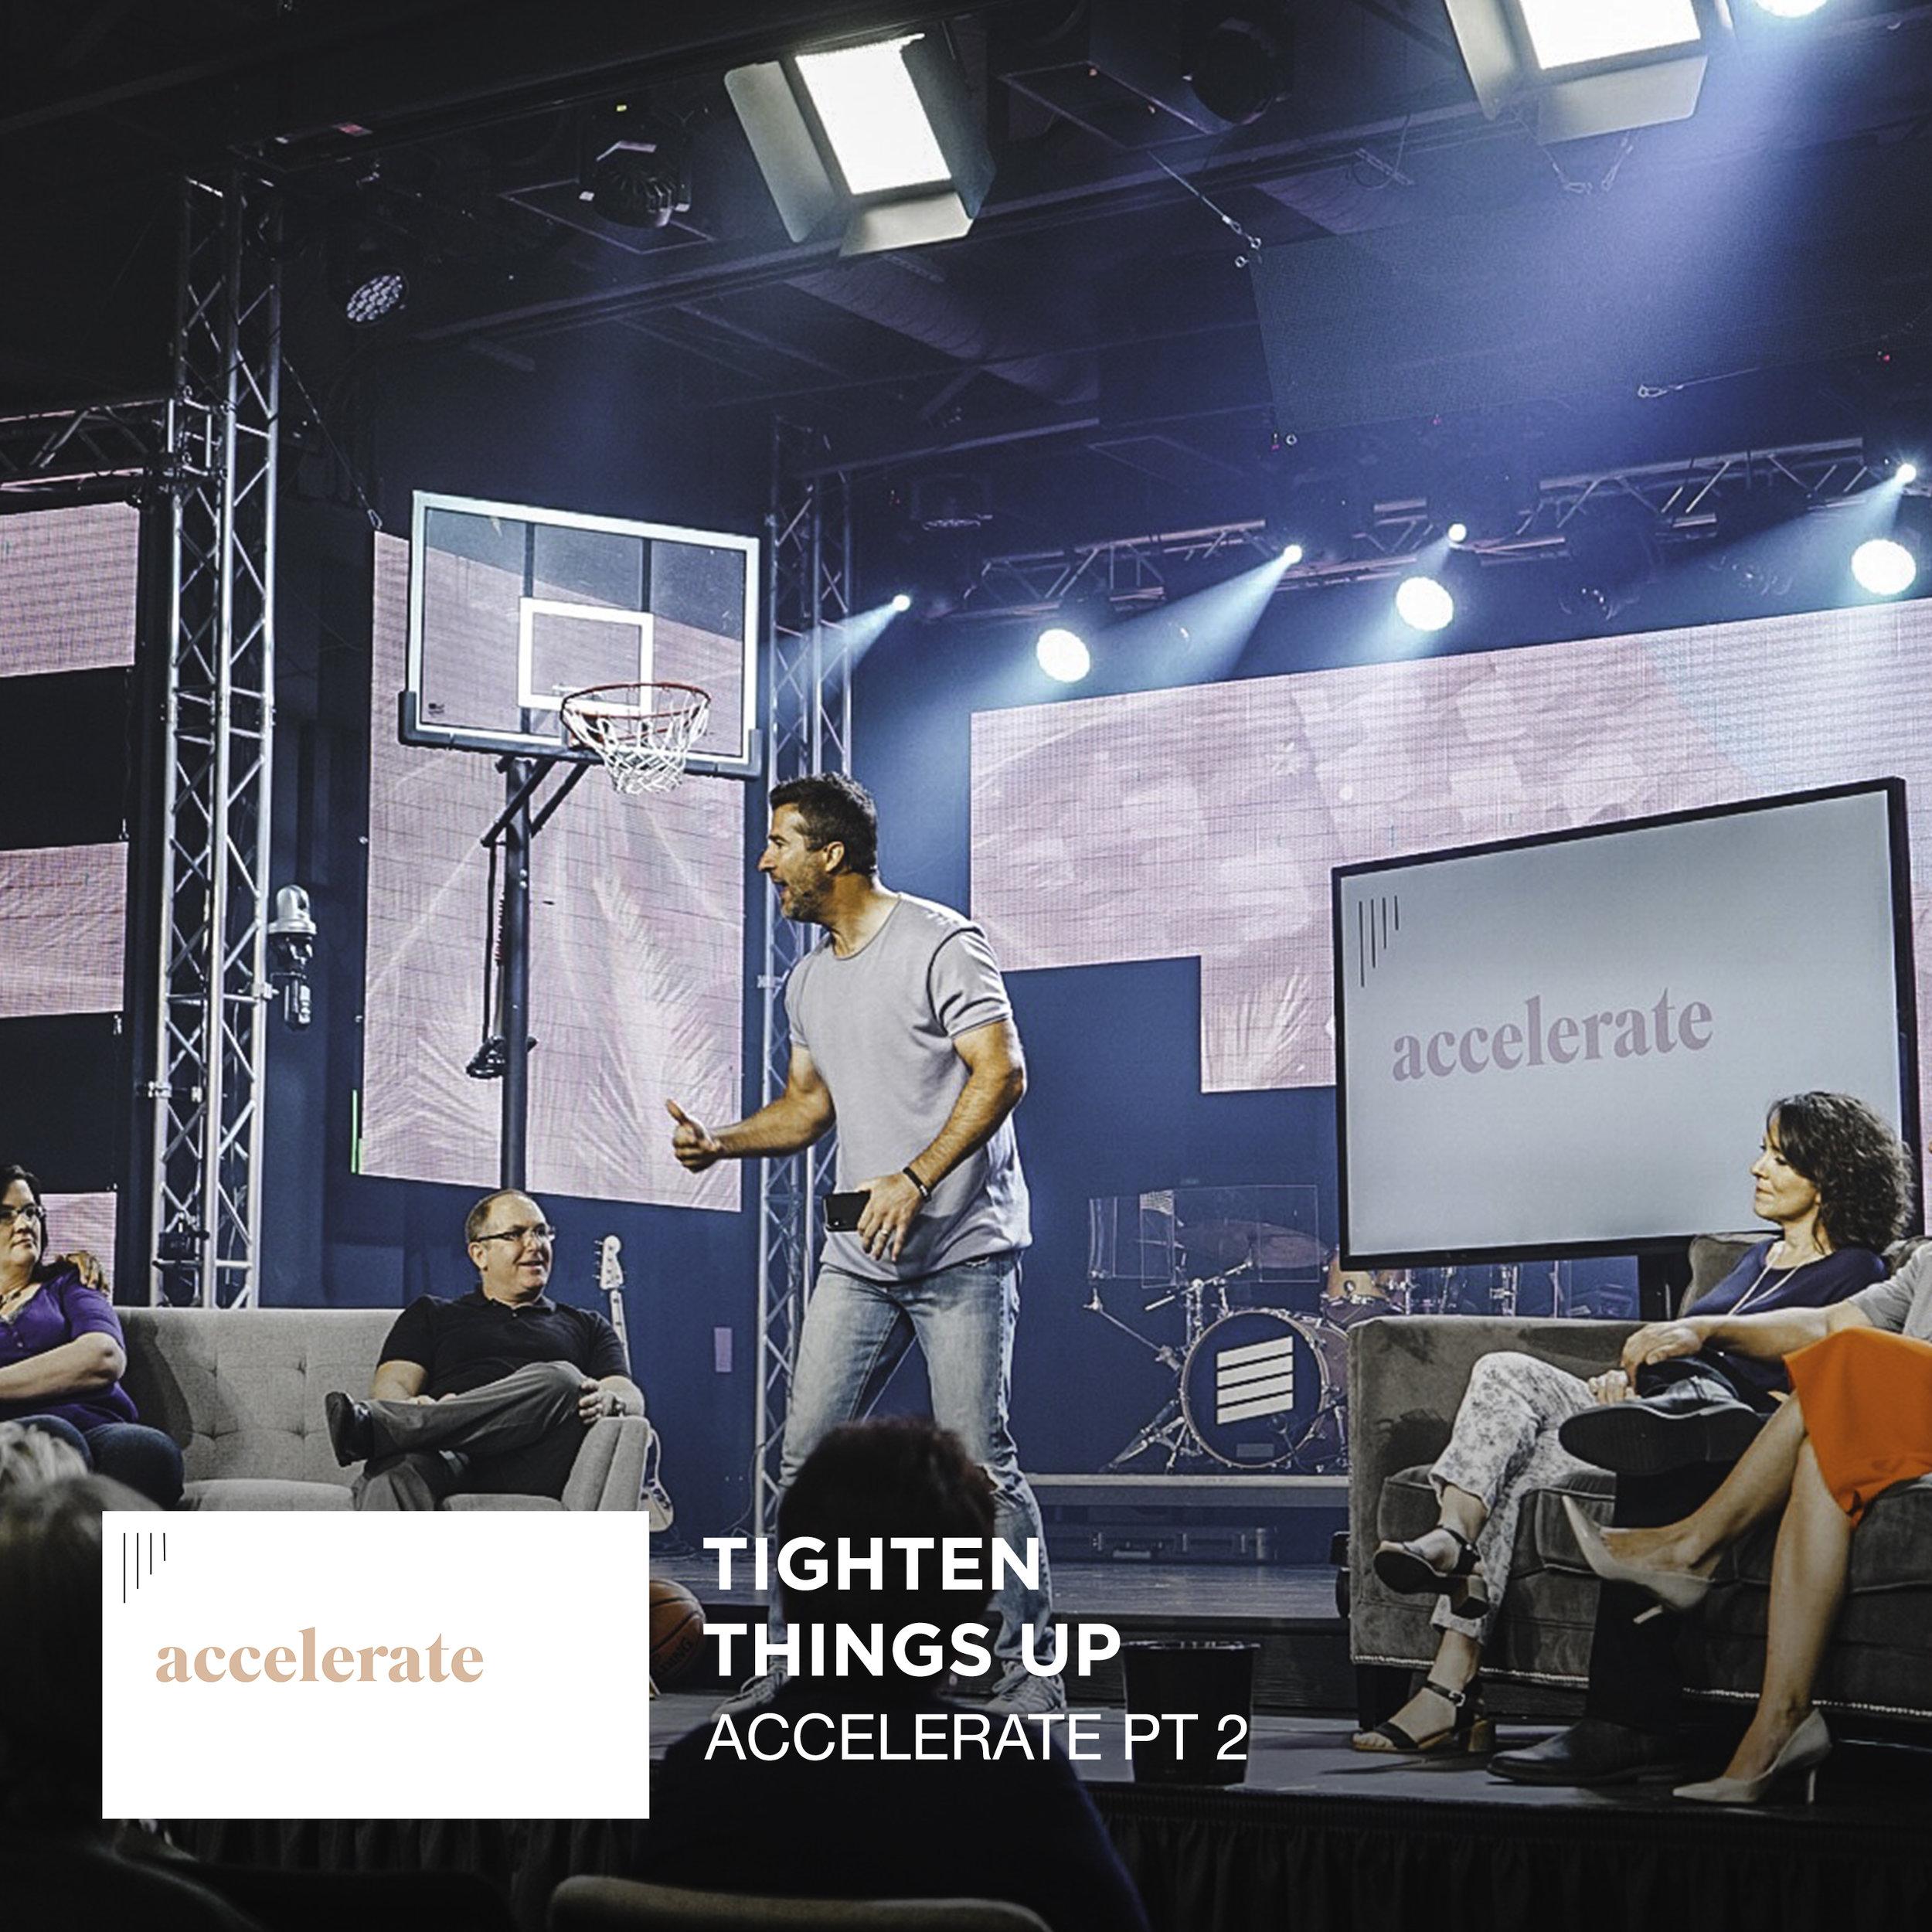 Accelerate Pt 2 - Tighten Things Up - Jared Ming Web.jpg